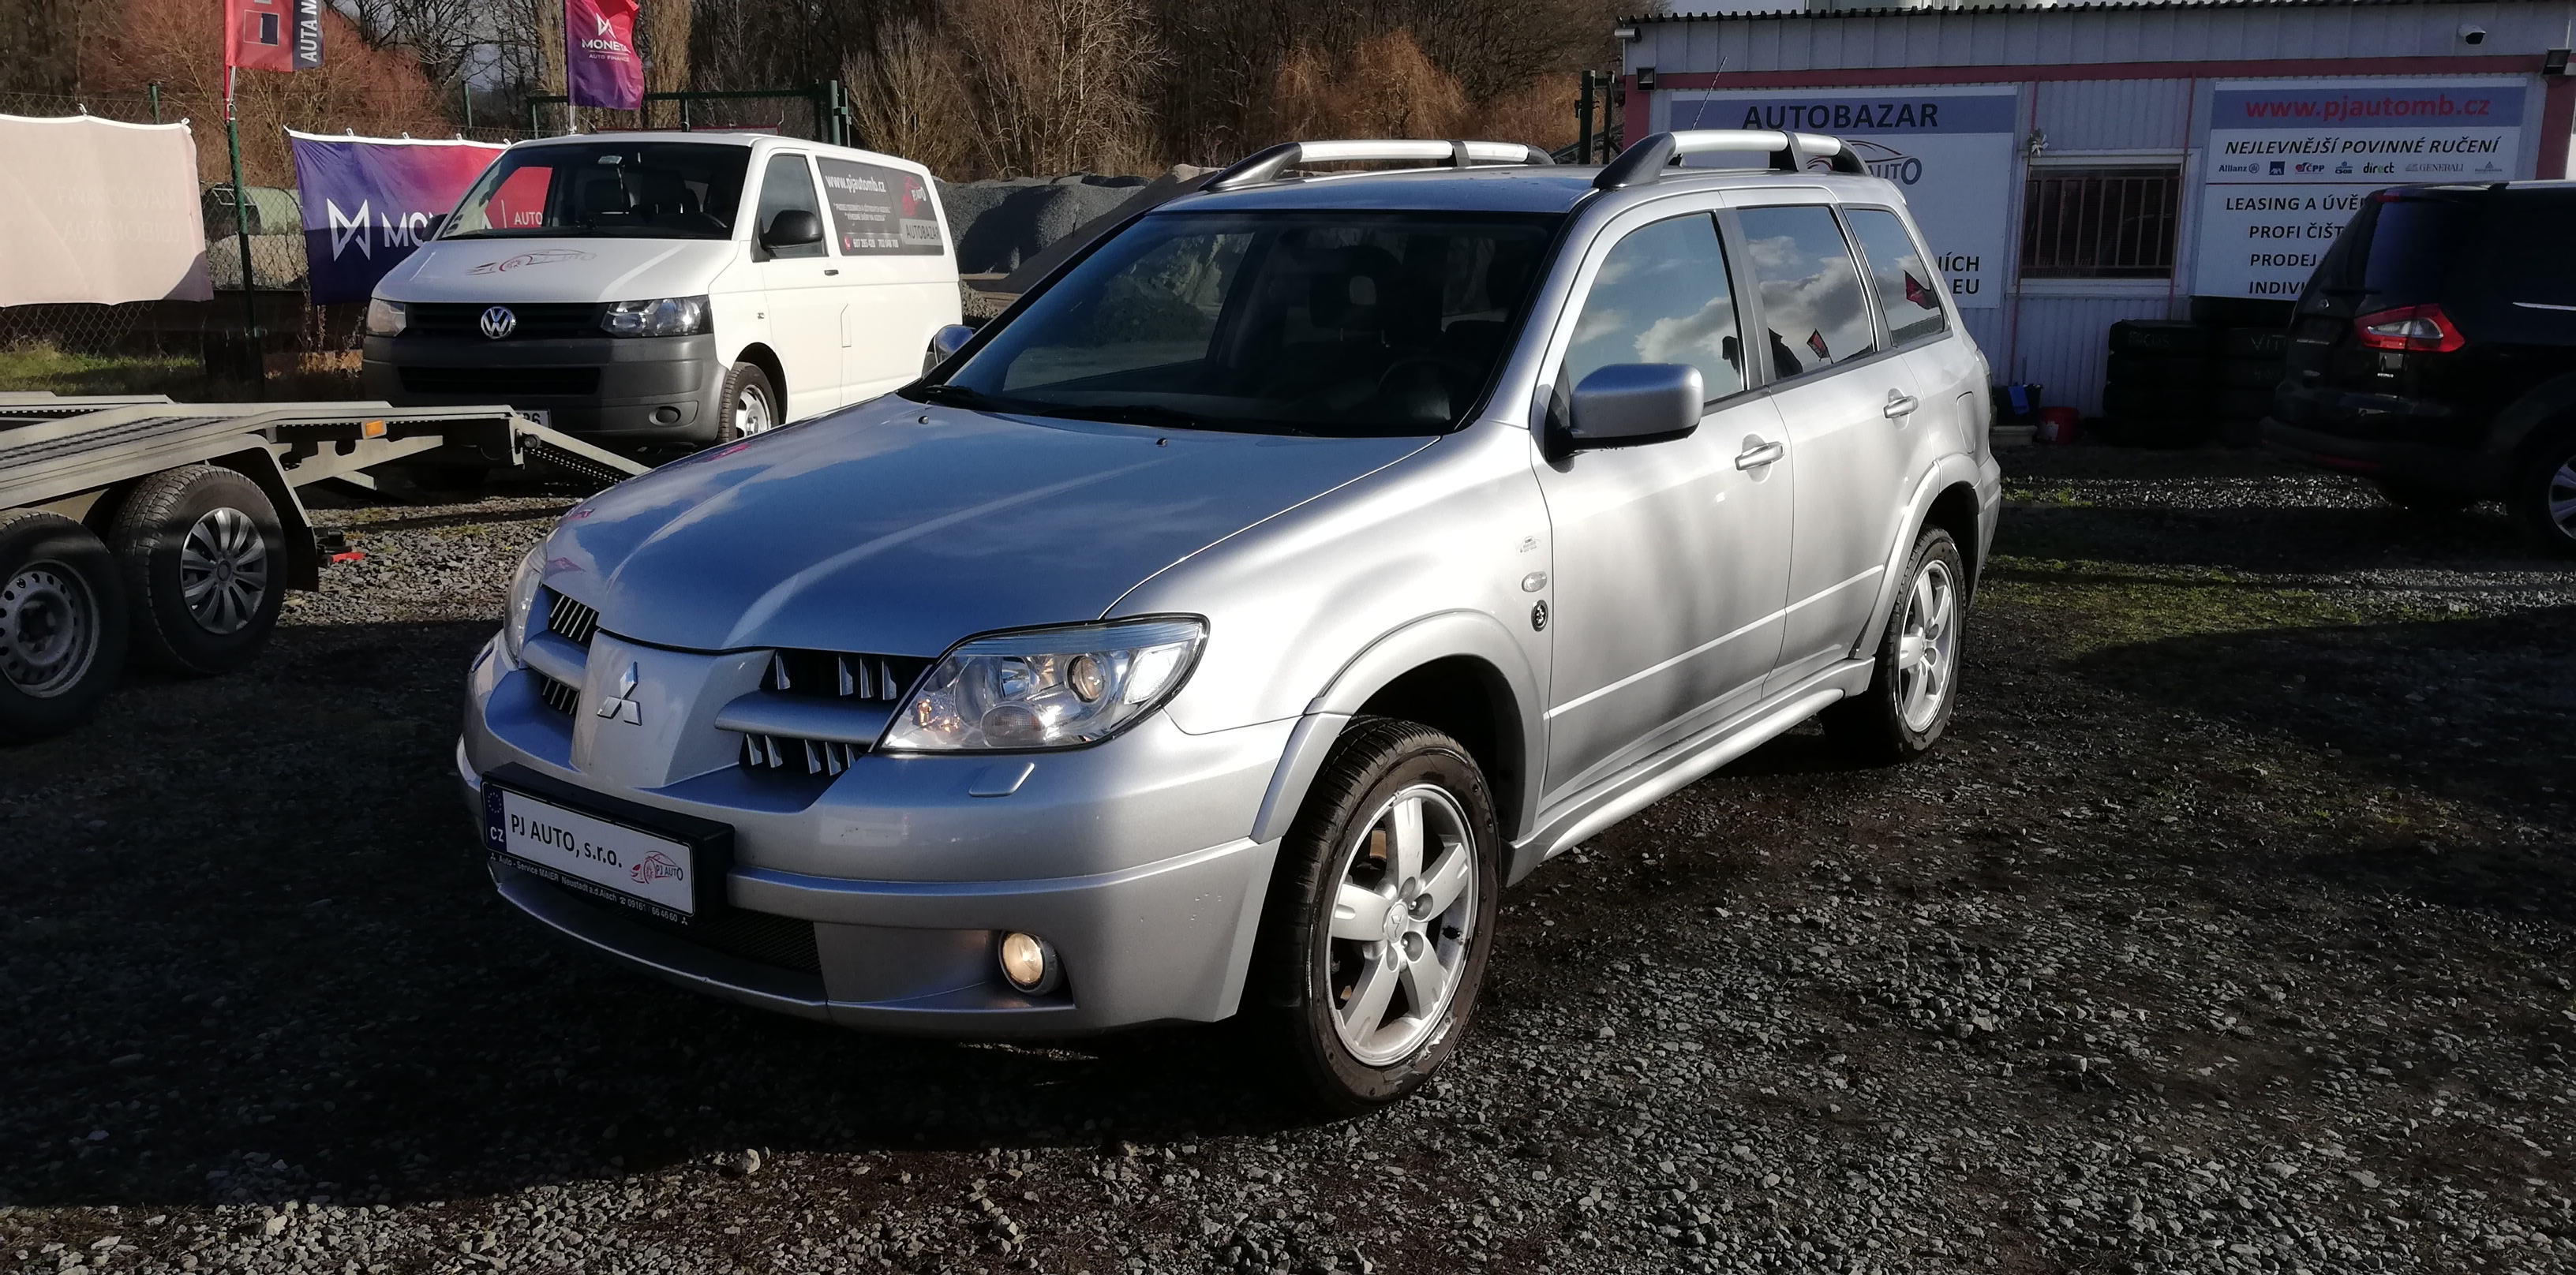 Mitsubishi Outlander 2.4i 118kW 4x4 DAKAR,ALU,Krasavec